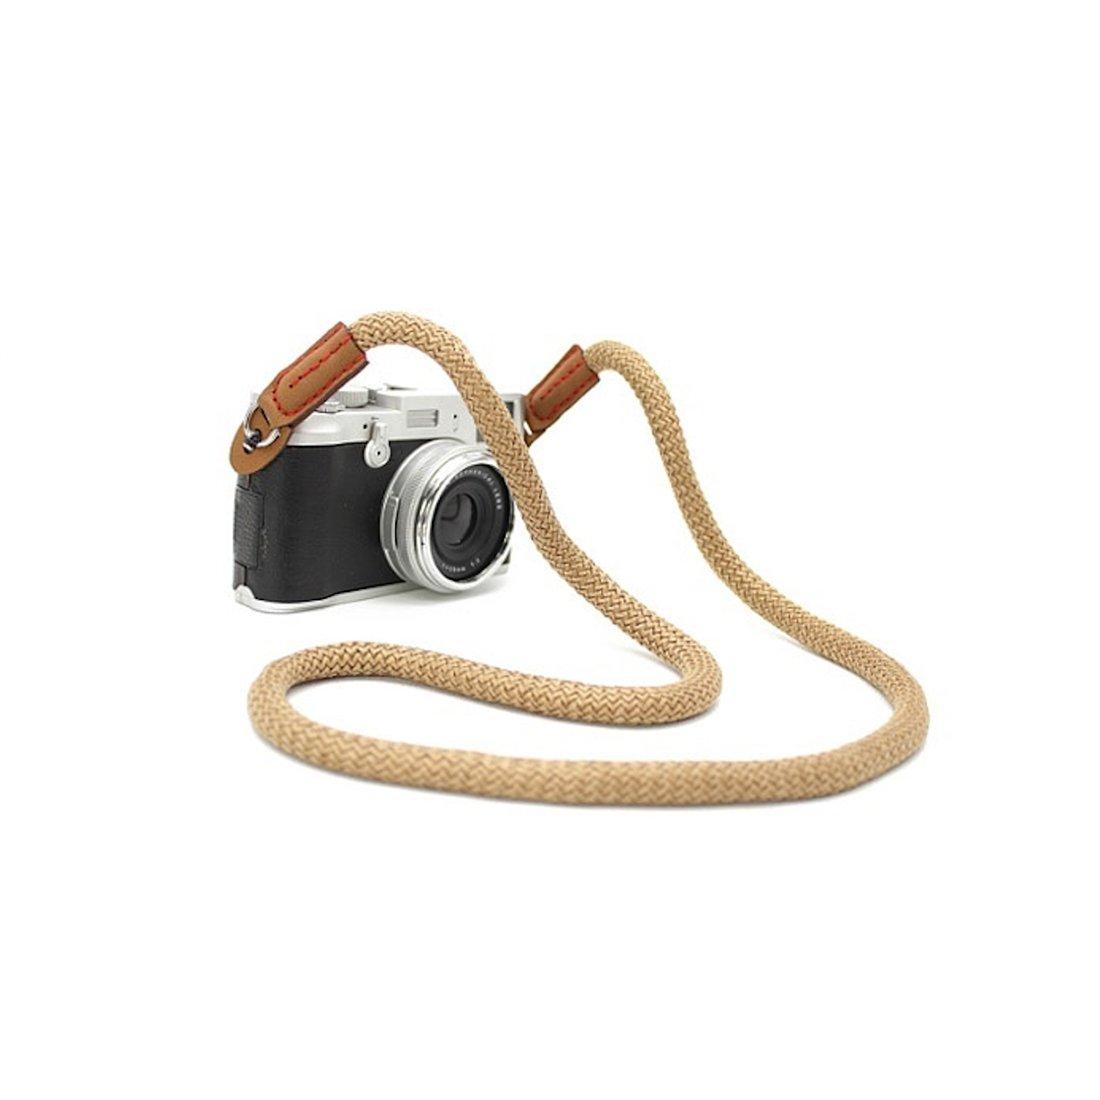 CTN Sangle pour Appareil Photo en Coton Beige bandouli/ère Courroie de Cou dragonne r/églable en n/éopr/ène pour DSLR Canon Fuji Fujifilm Leica Nikon Pentax Olympus Sony Panasonic Pentax Samsung Sigma